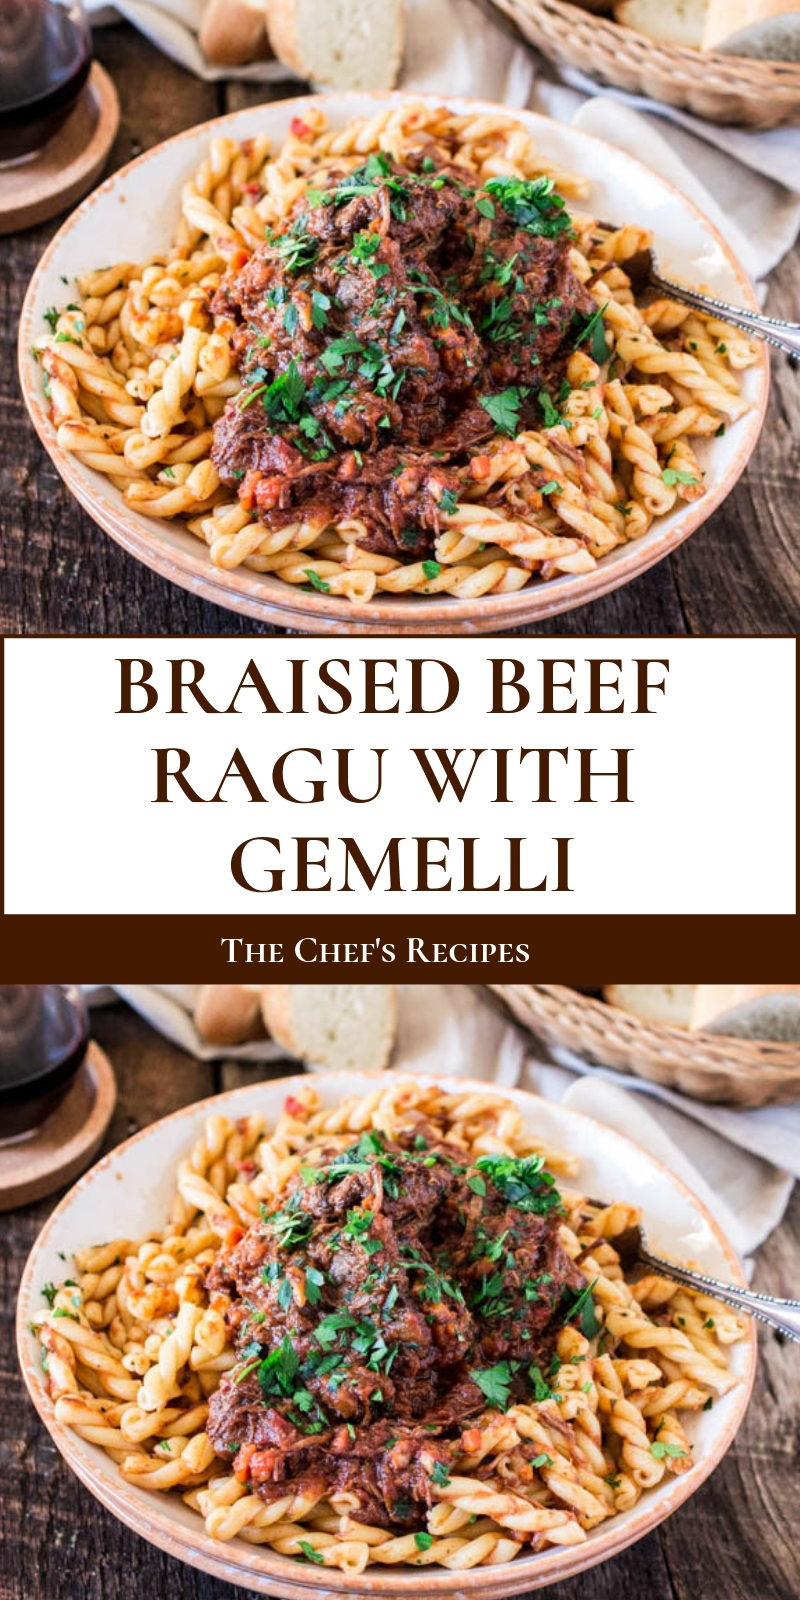 BRAISED BEEF RAGU WITH GEMELLI